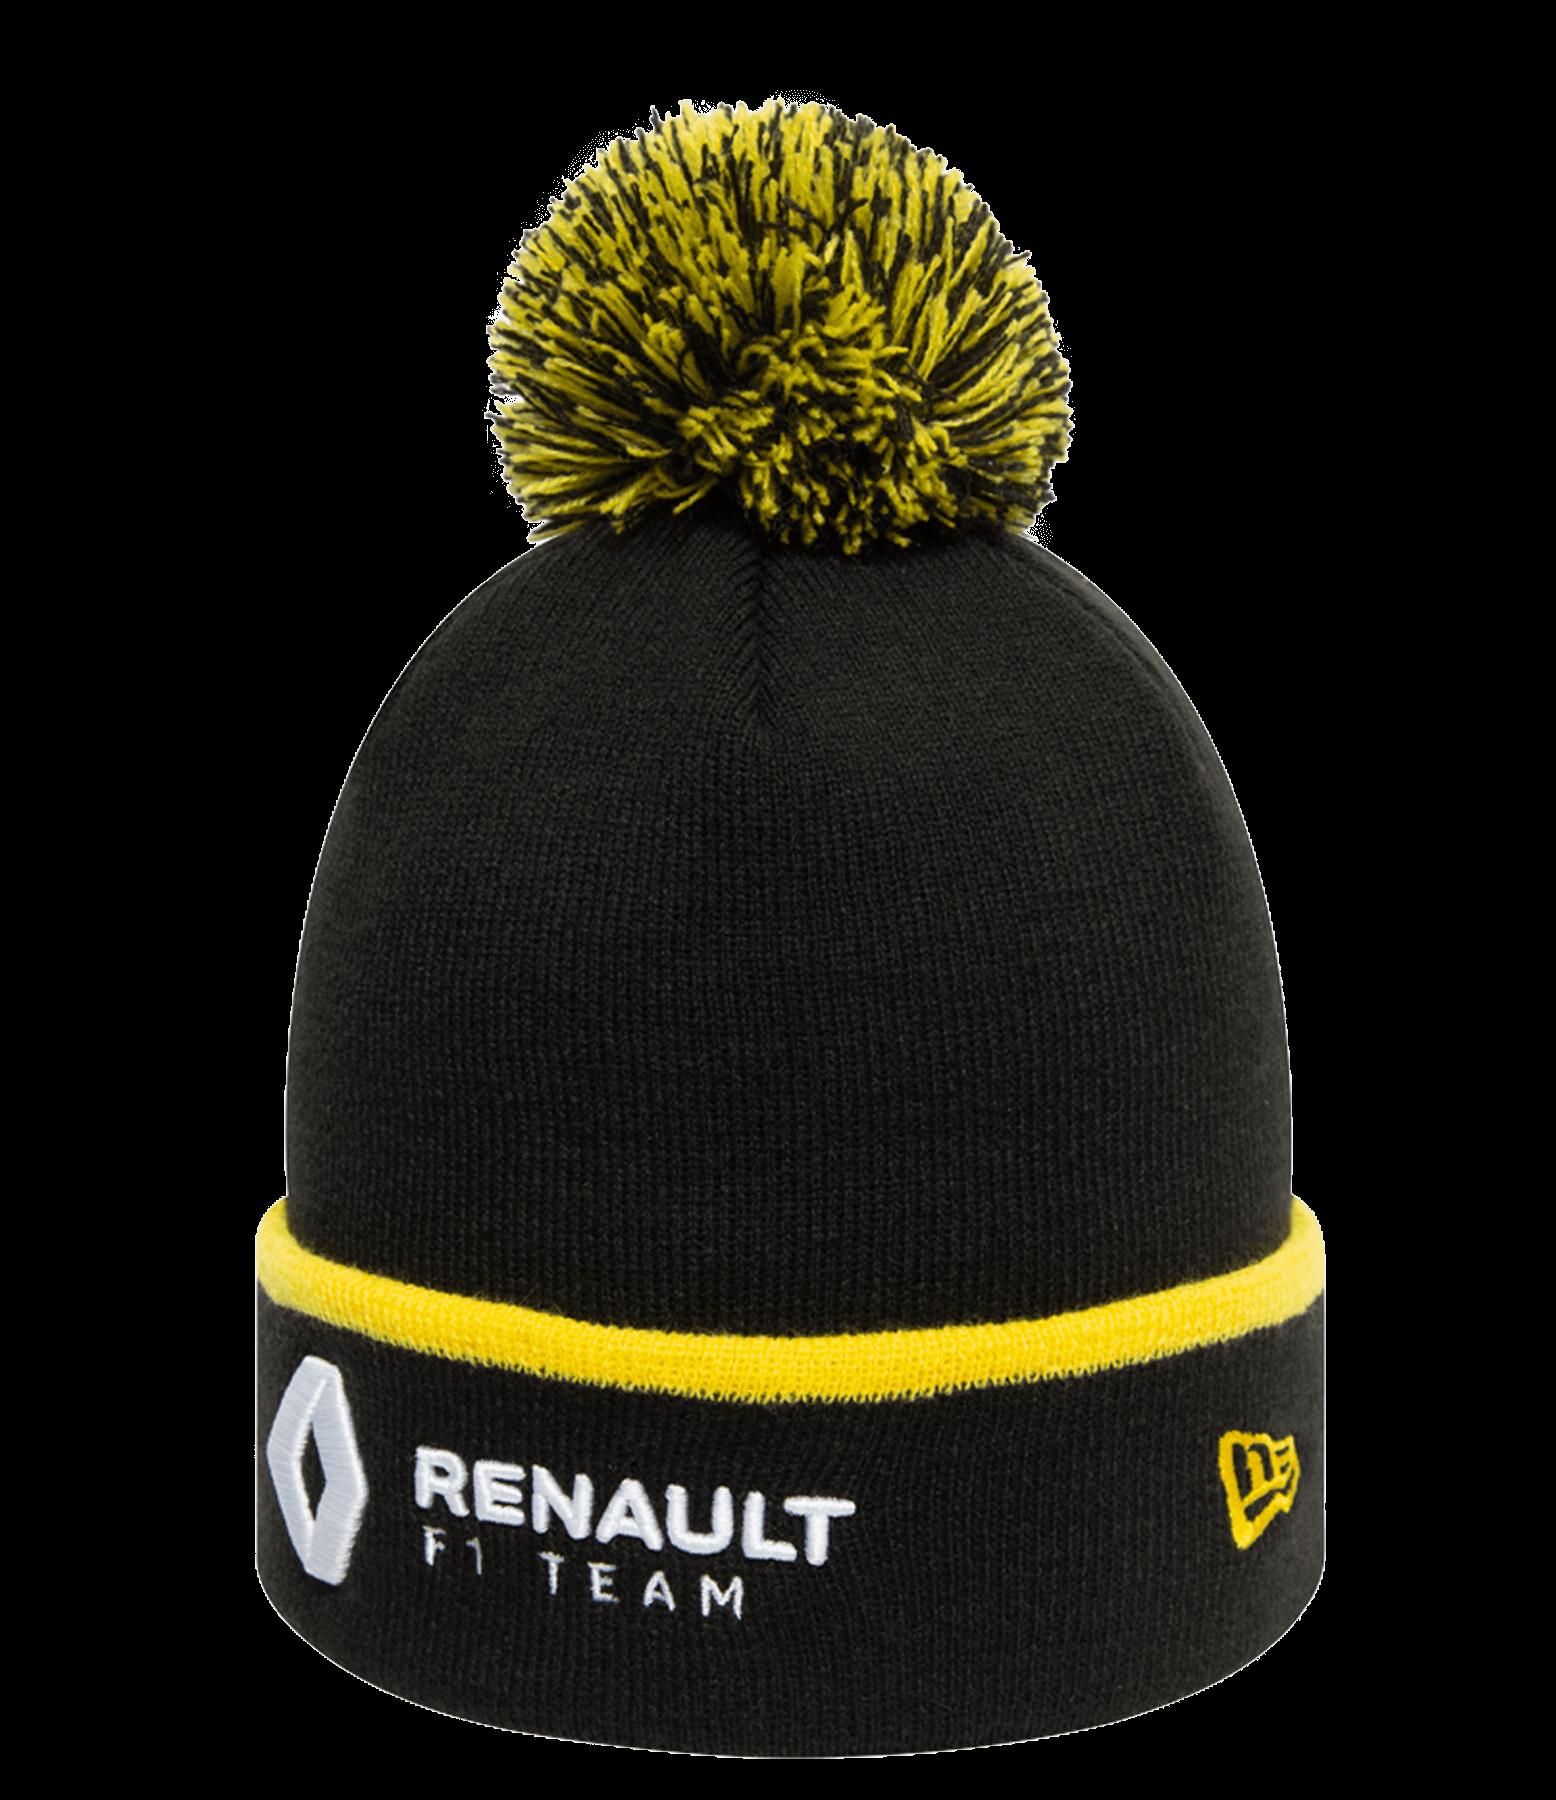 RENAULT F1® TEAM 2019 bobble beanie